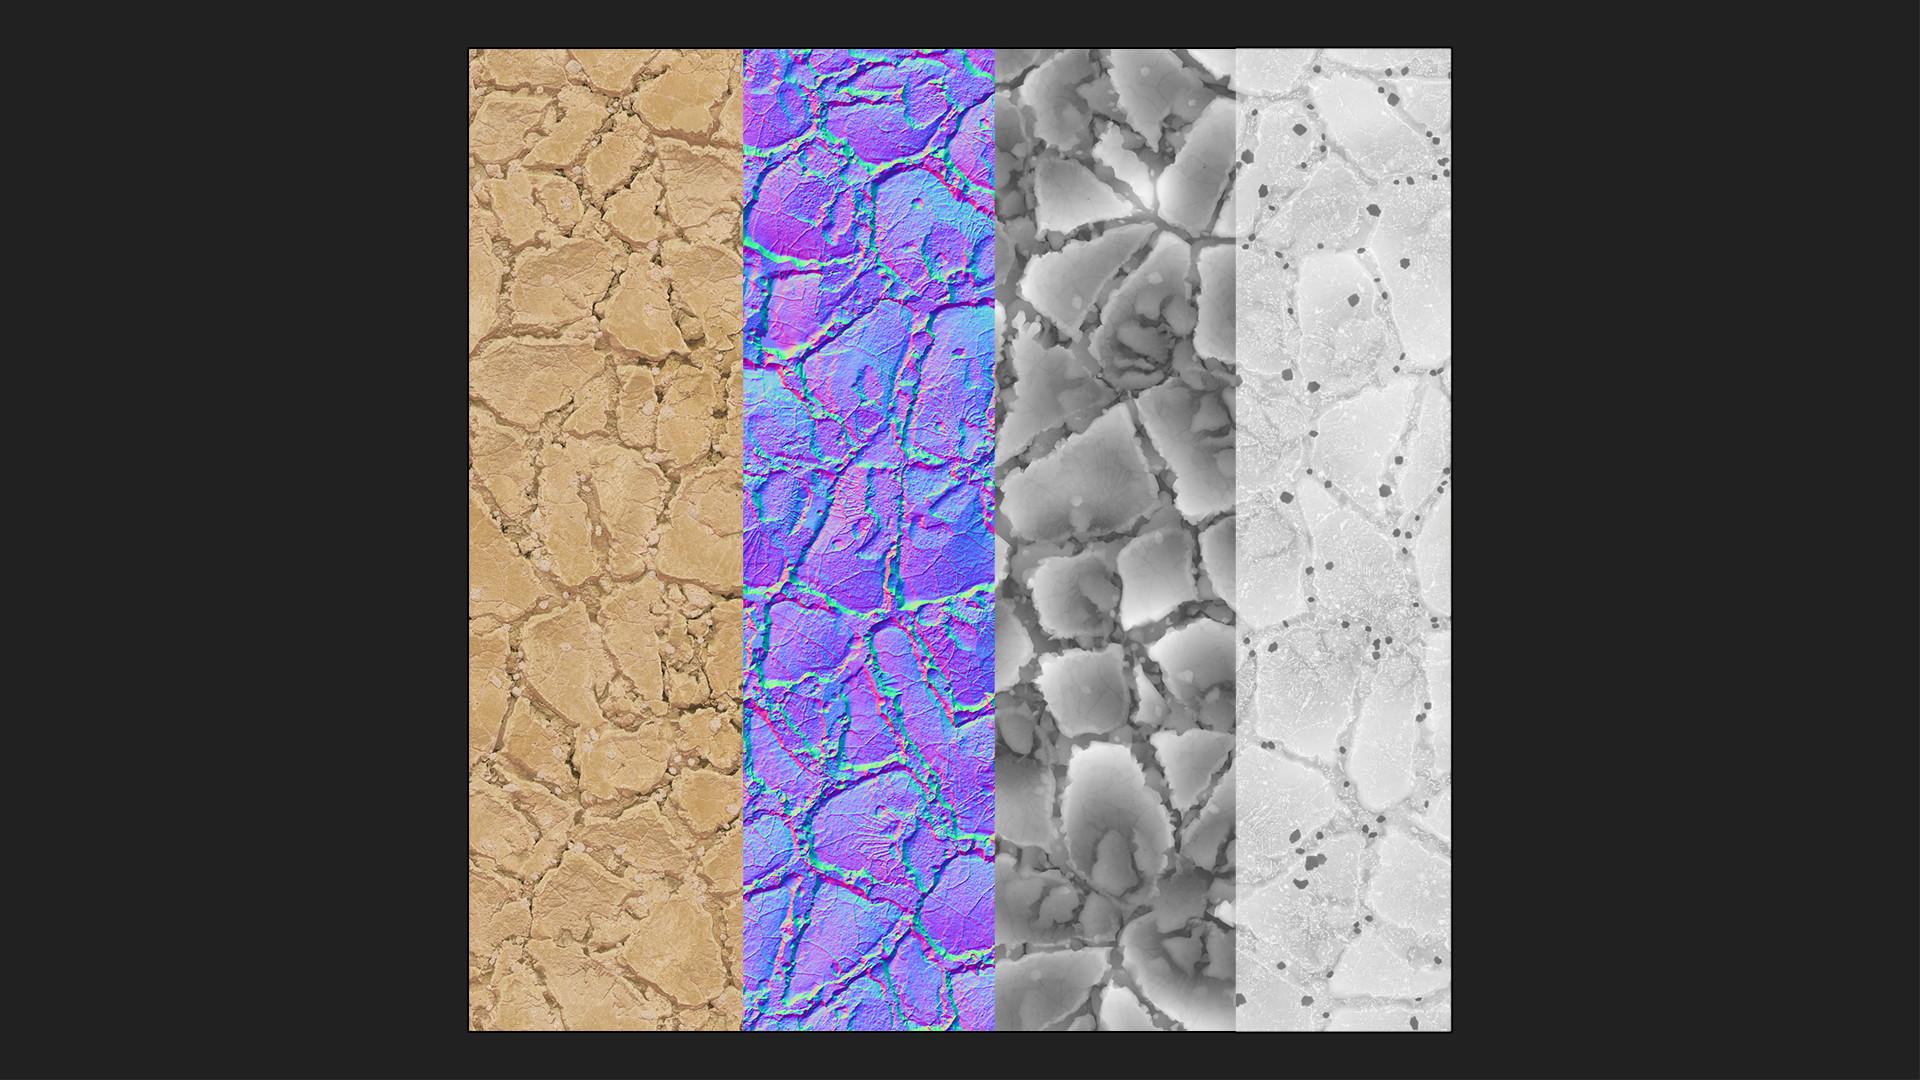 Olle norling texturemaps